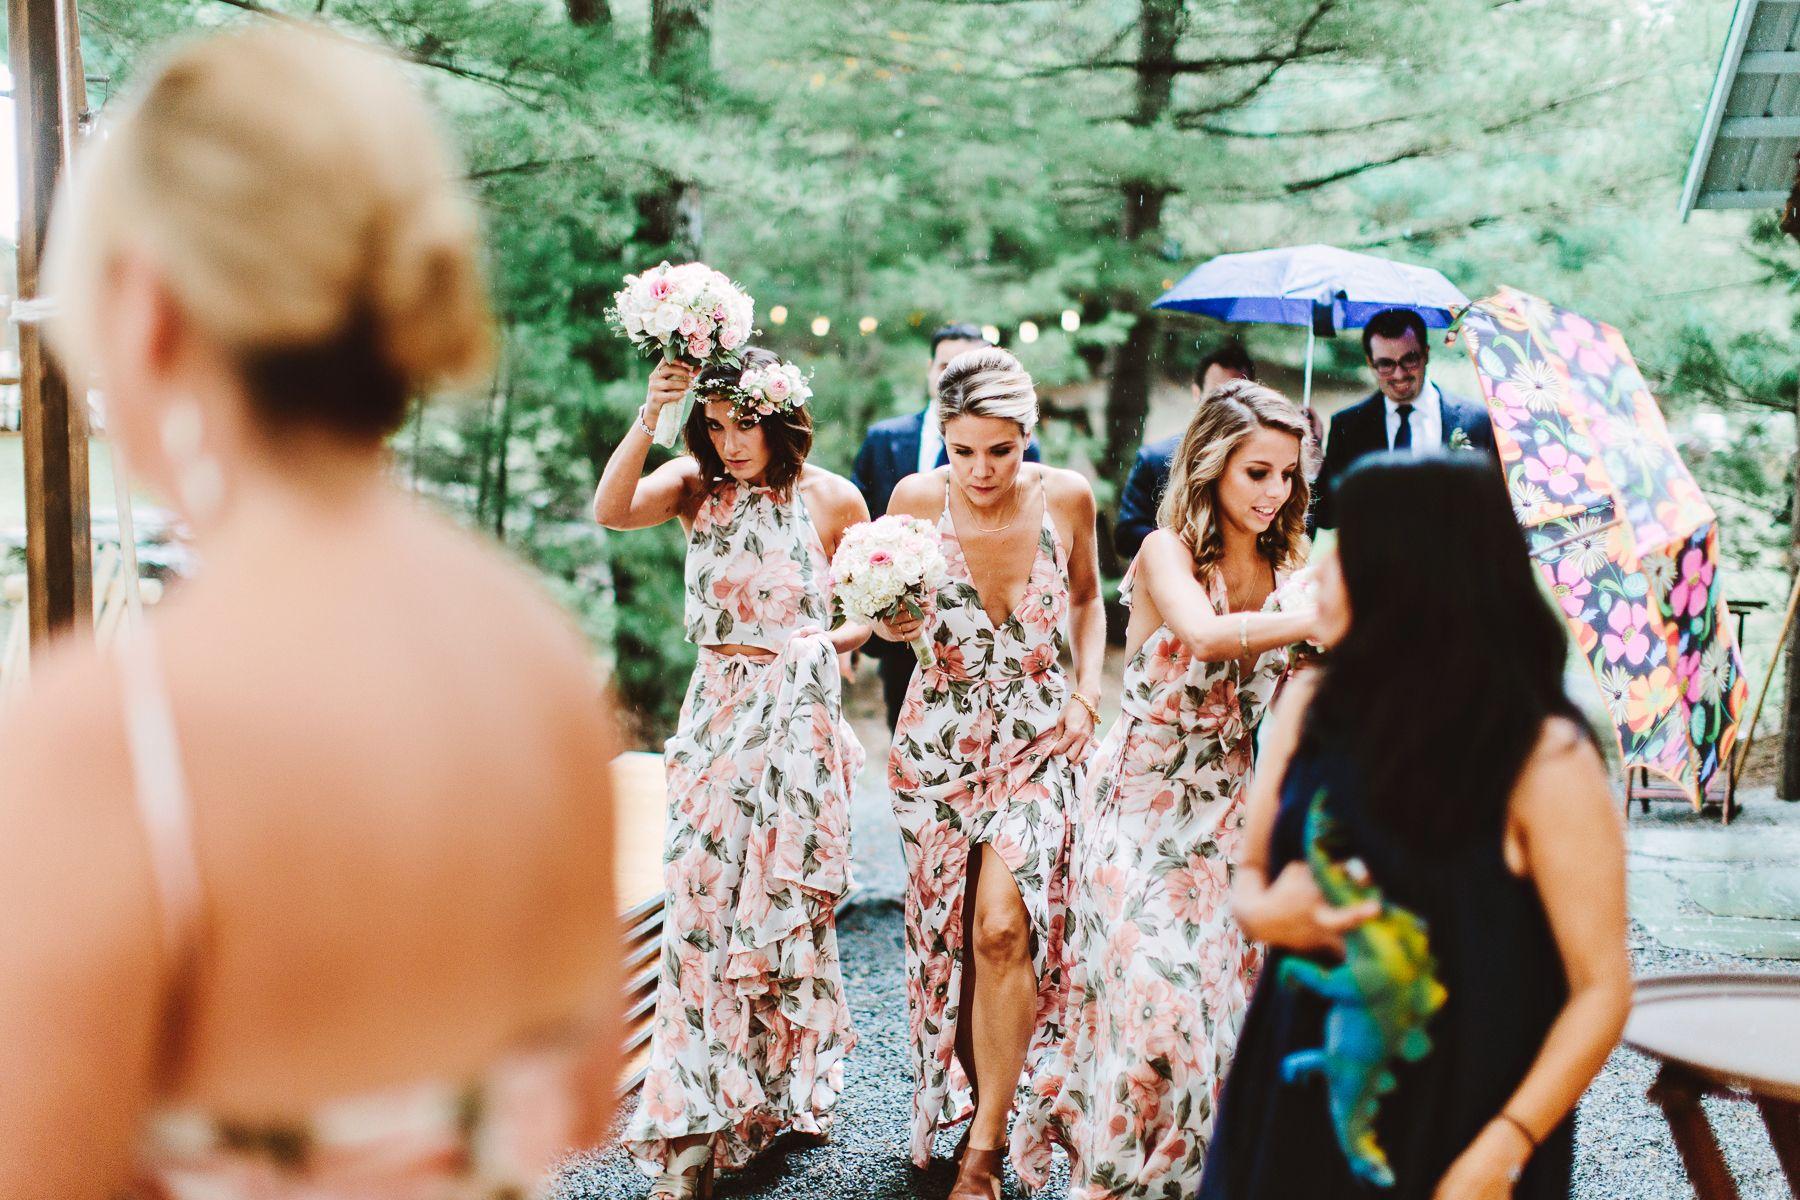 Floral bridesmaid dresses ah ugh pinterest floral floral bridesmaid dresses ah ombrellifo Image collections